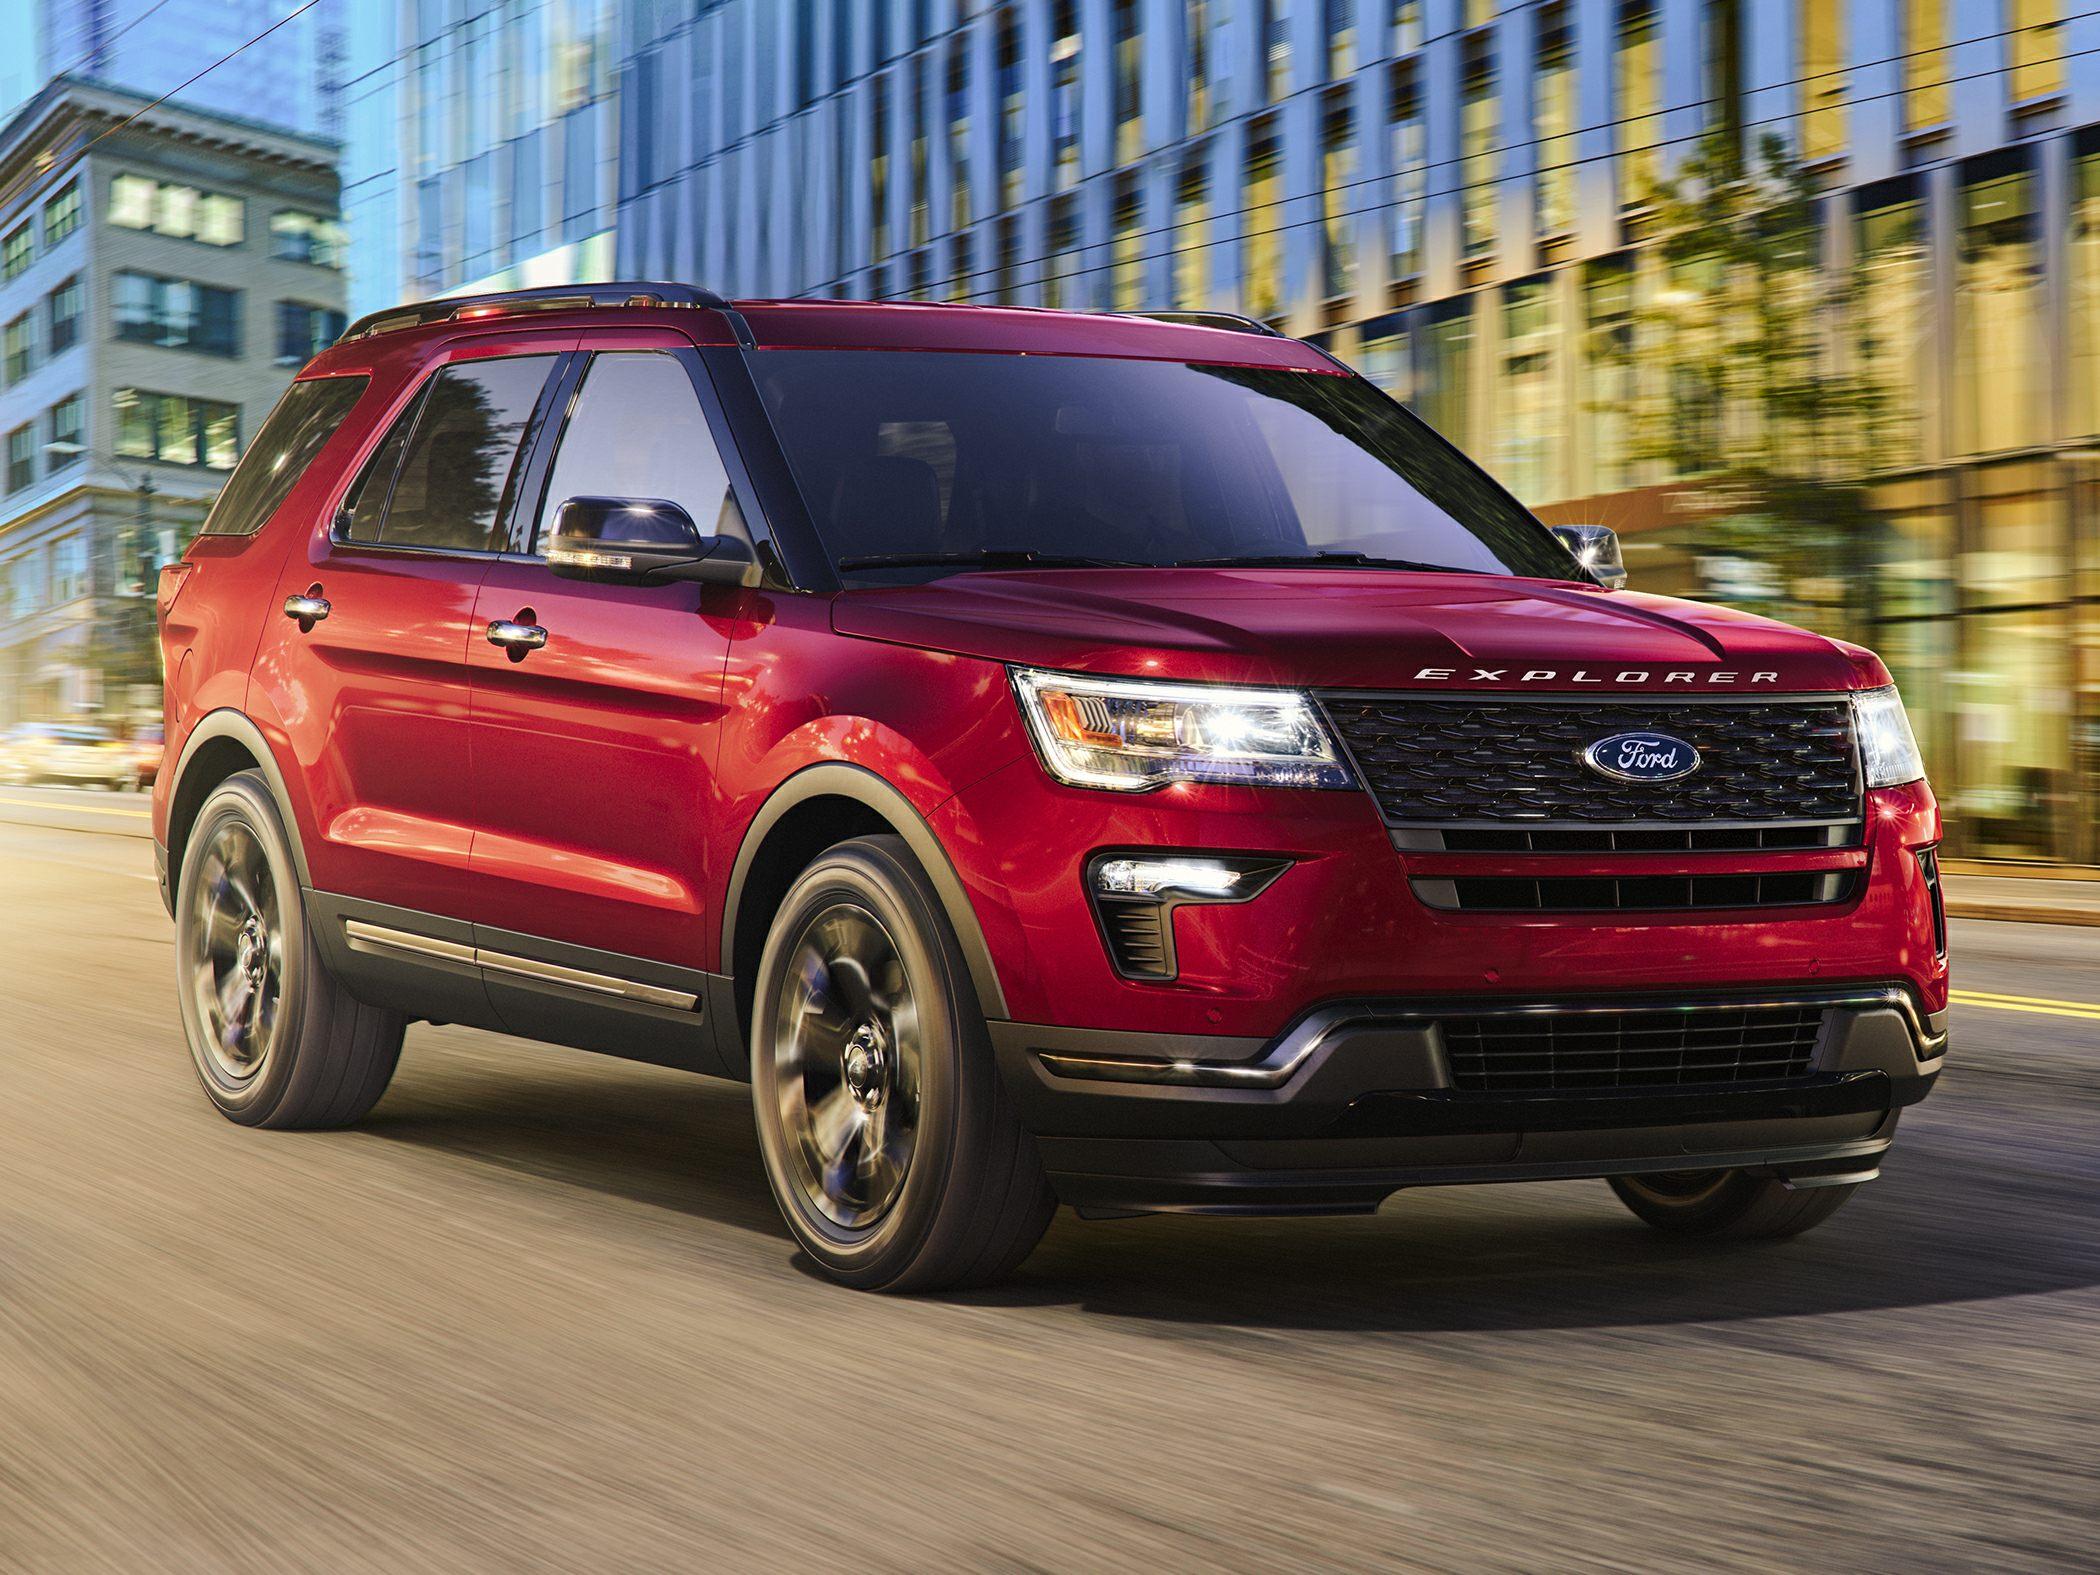 2018 Ford Explorer for sale in Unionville Markville Ford